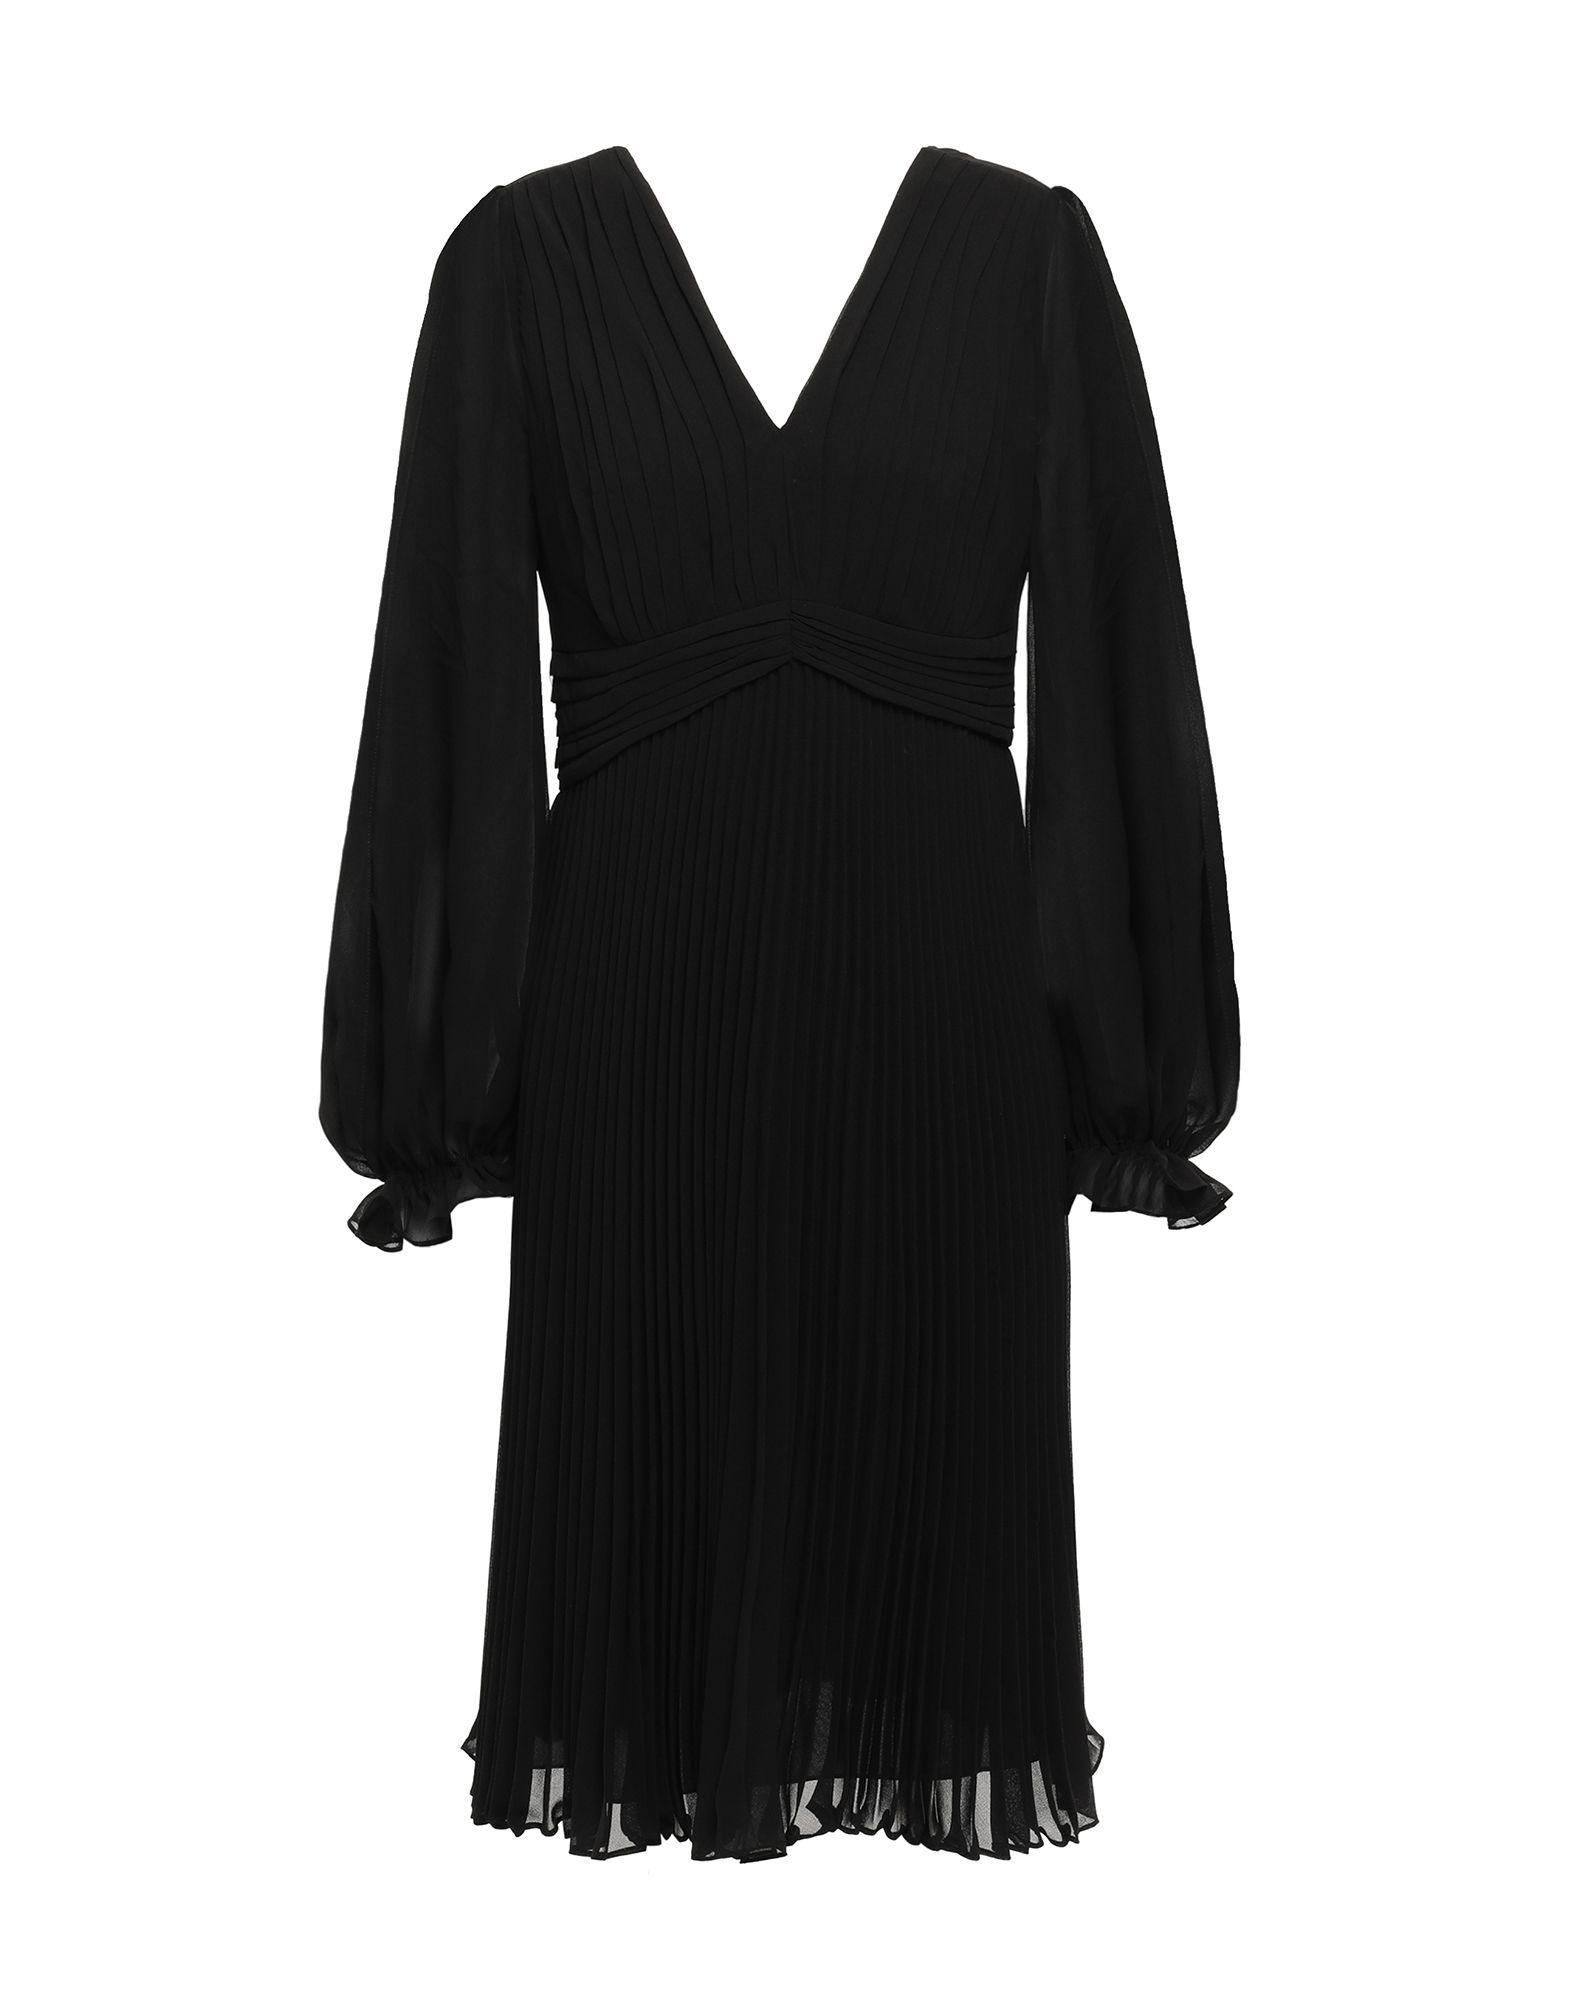 Фото - MIKAEL AGHAL Короткое платье mikael aghal юбка до колена